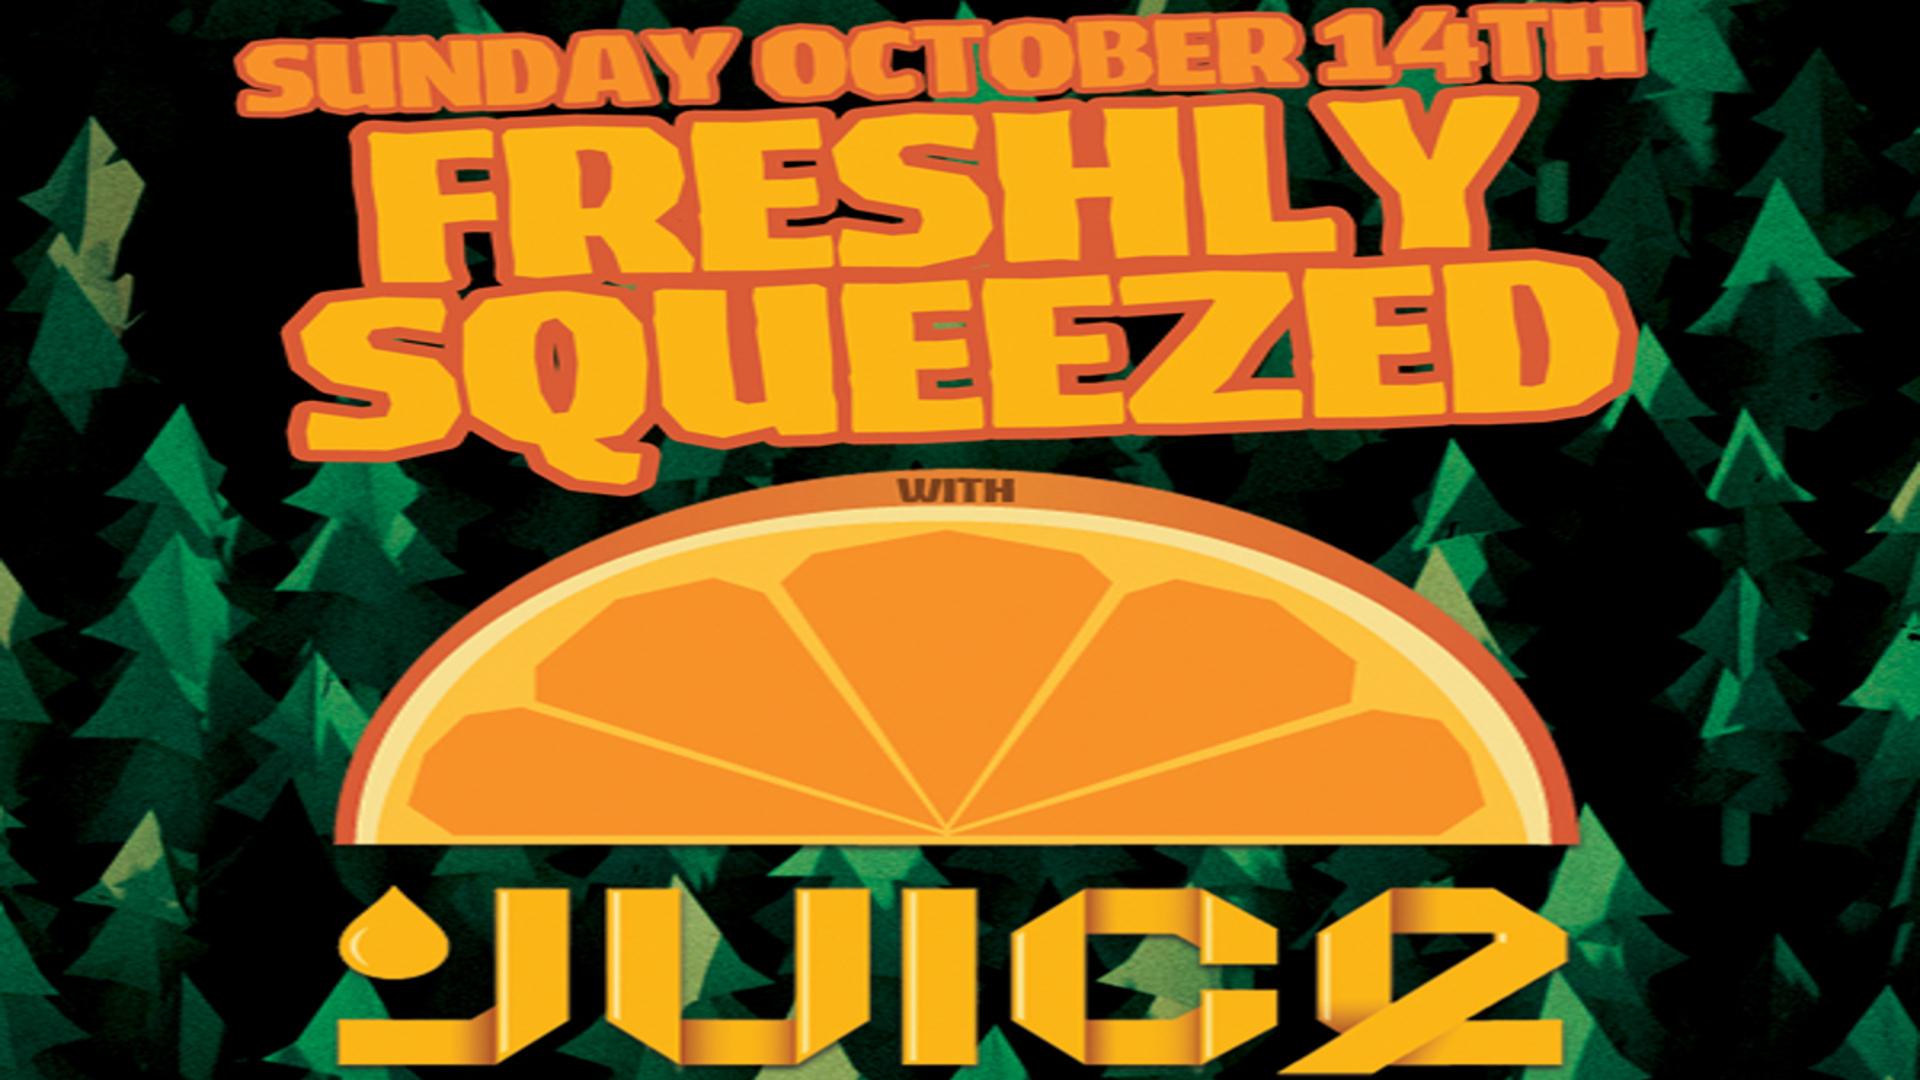 sasquatch juice sun oct 14 event.jpg